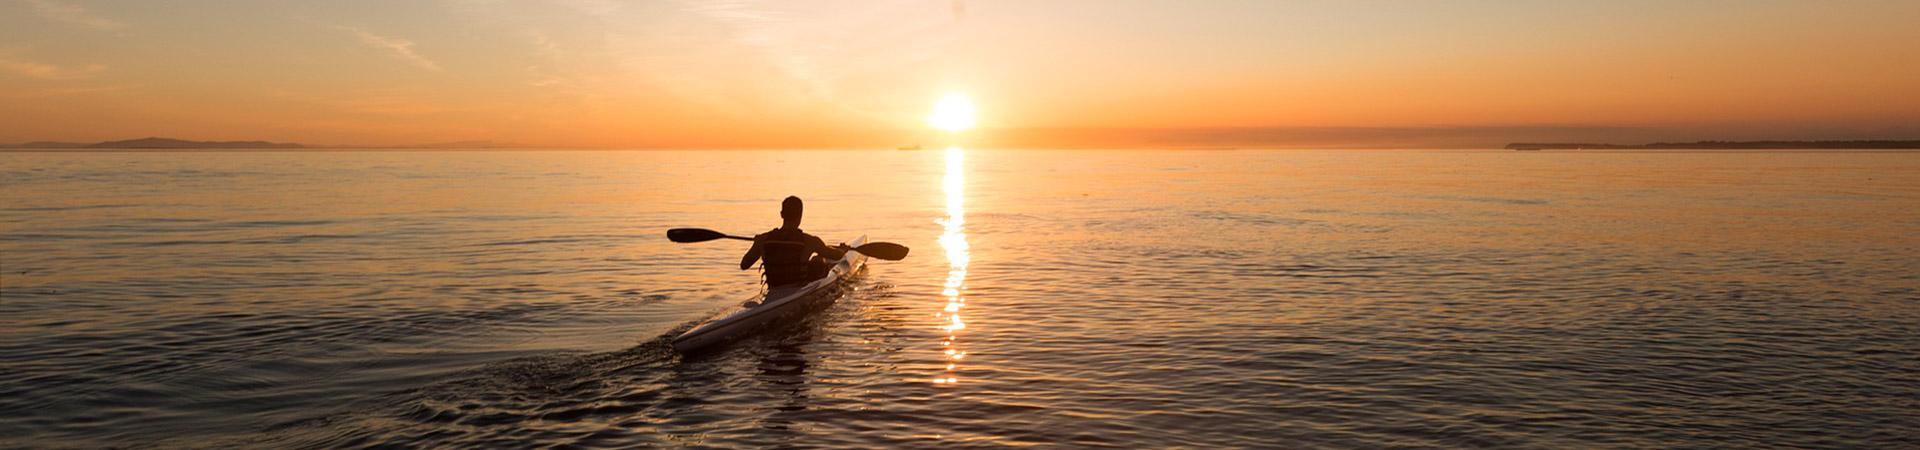 kayak-couche-soleil-camping-merendella